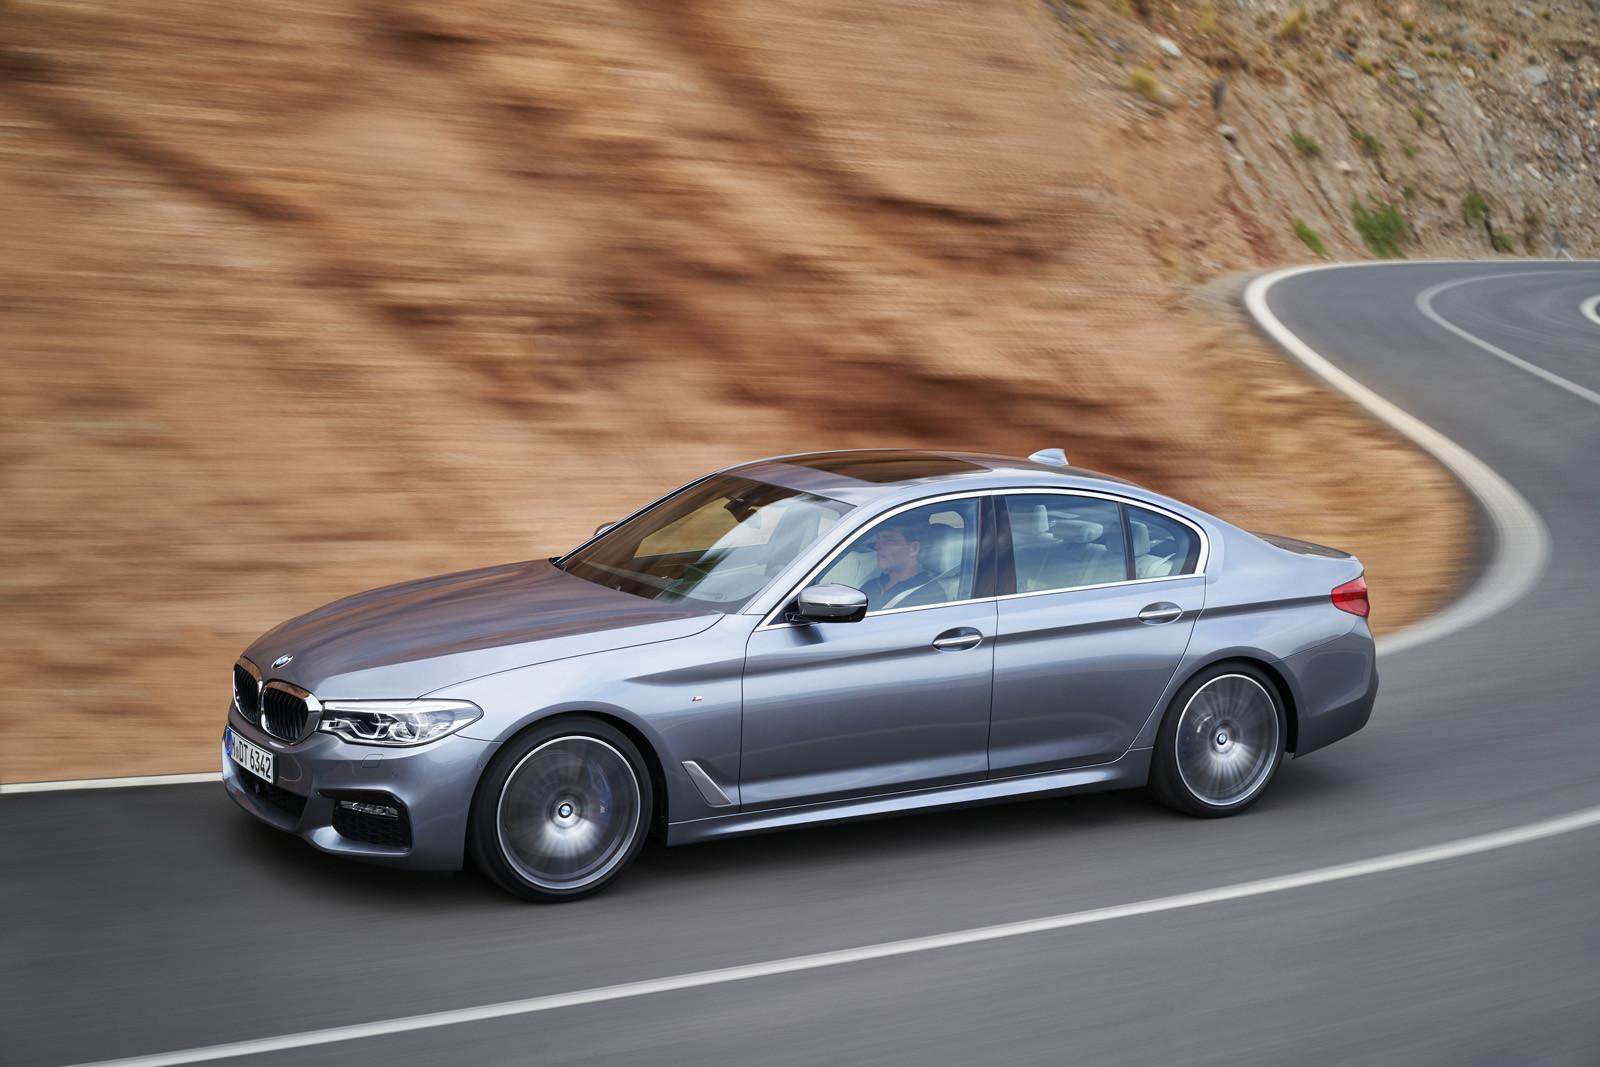 Foto de BMW Serie 5 2017 (10/10)